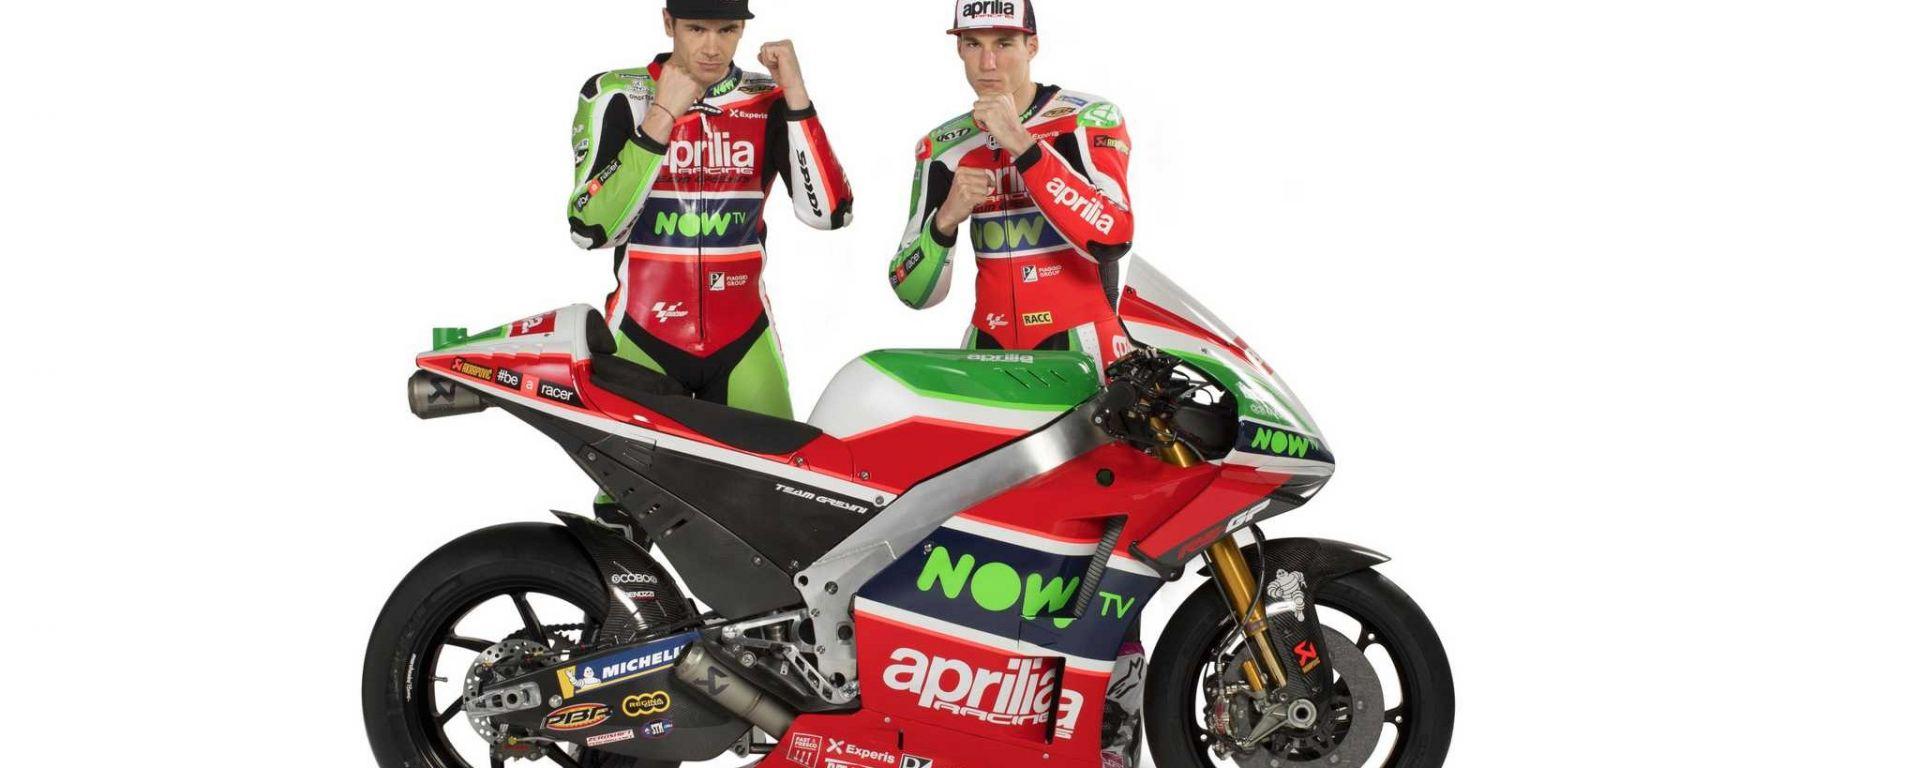 Aprilia Racing Team Gresini 2018